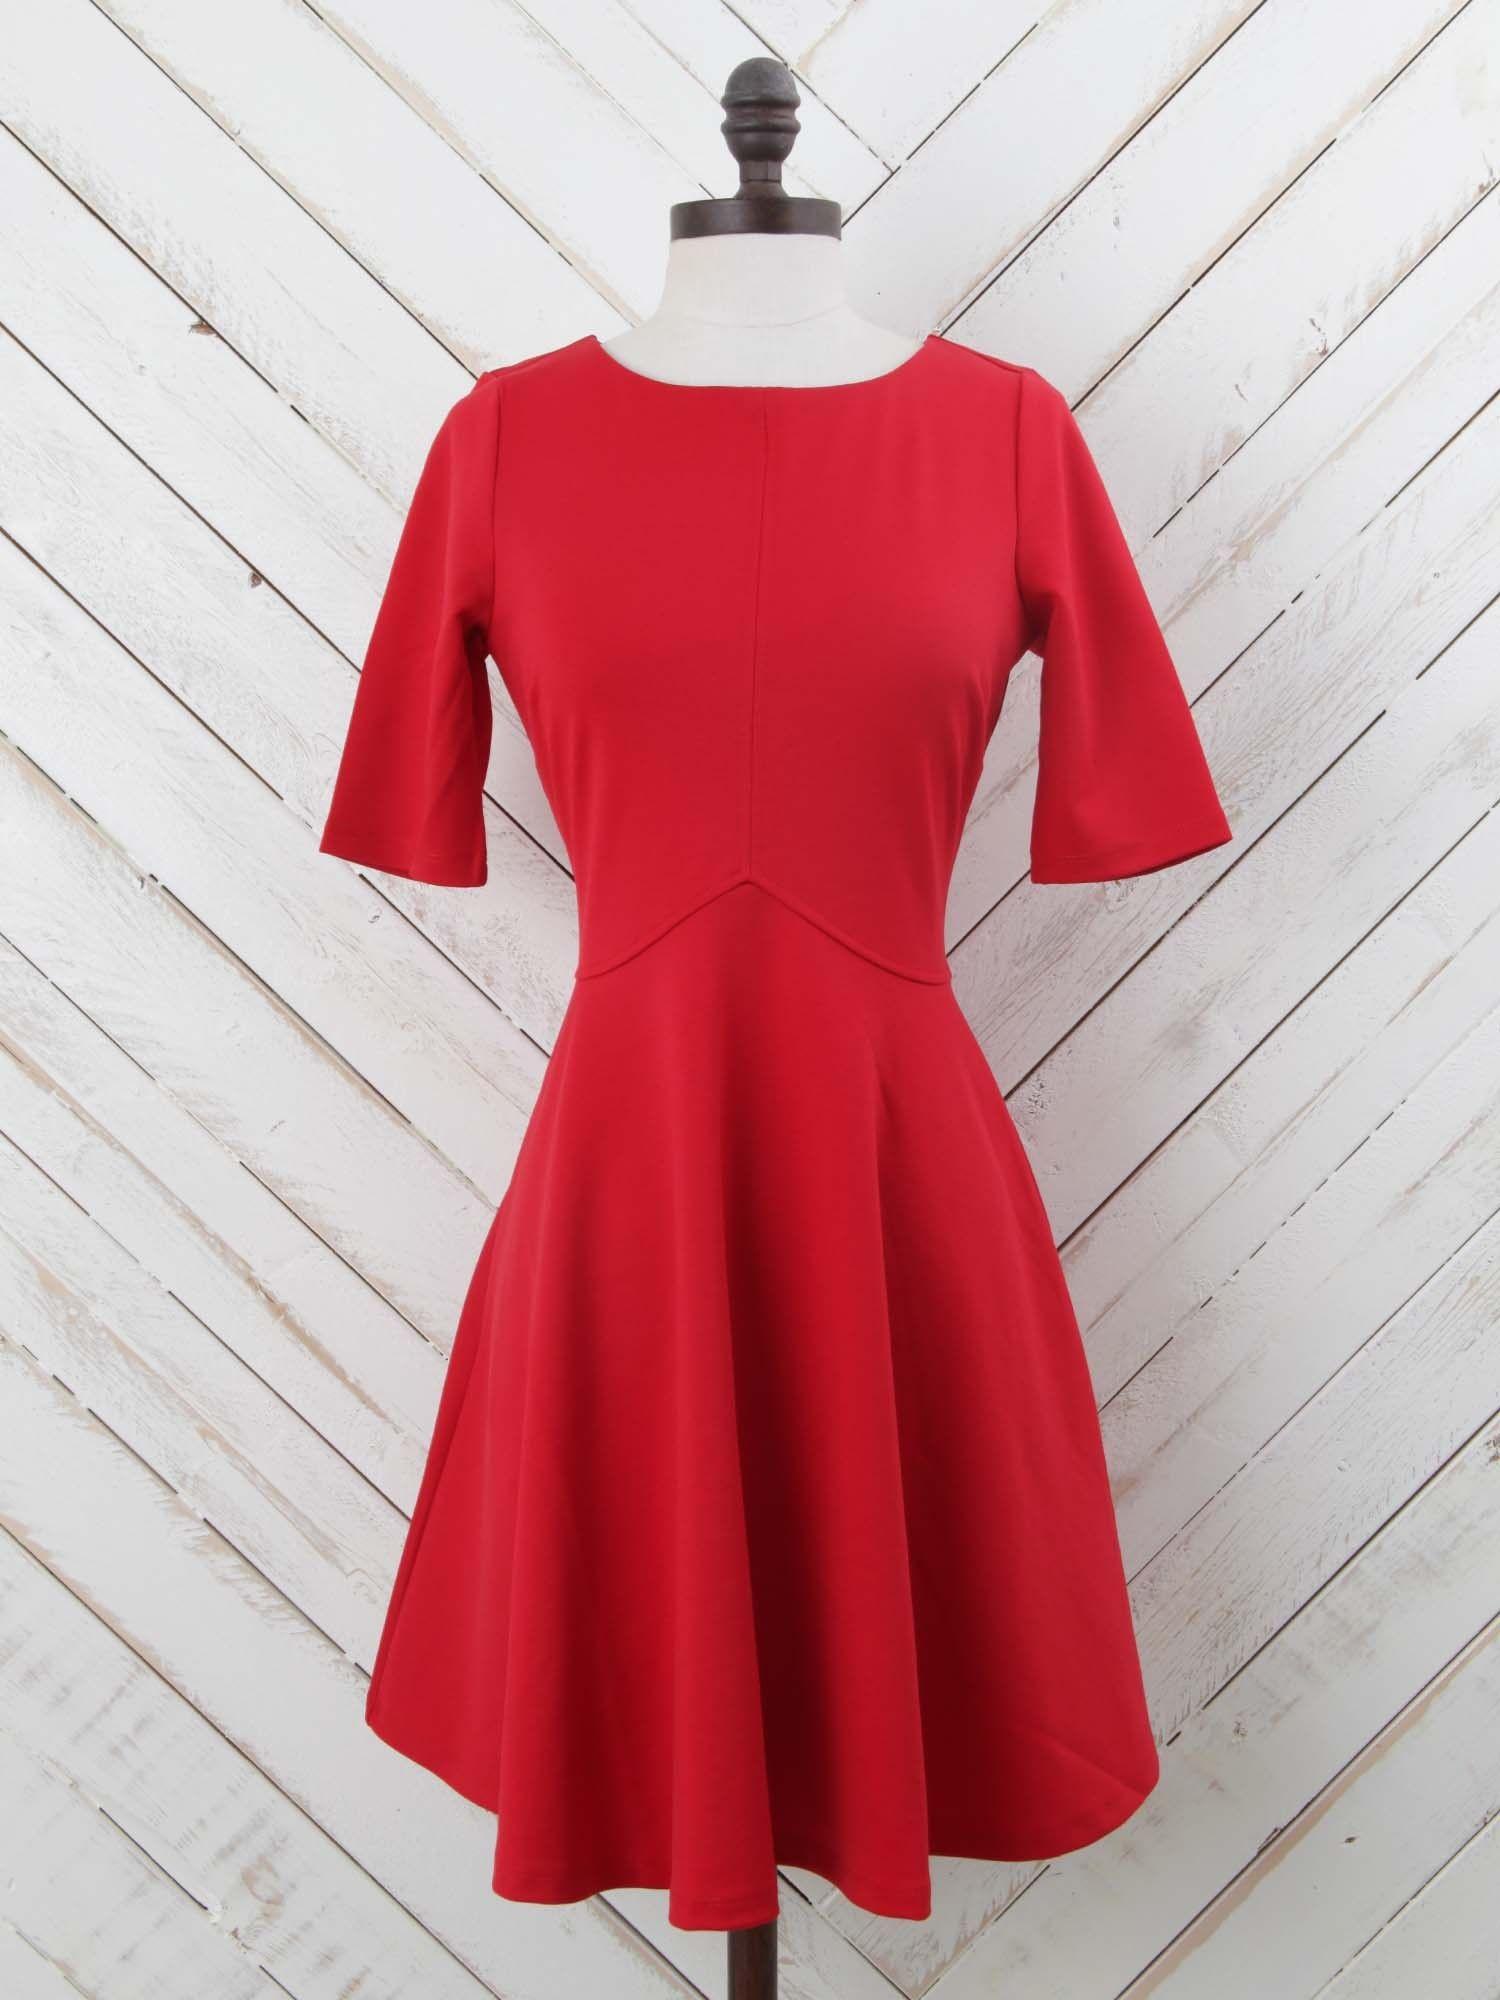 Altar'd State Cherry Swirl Dress Dresses Apparel